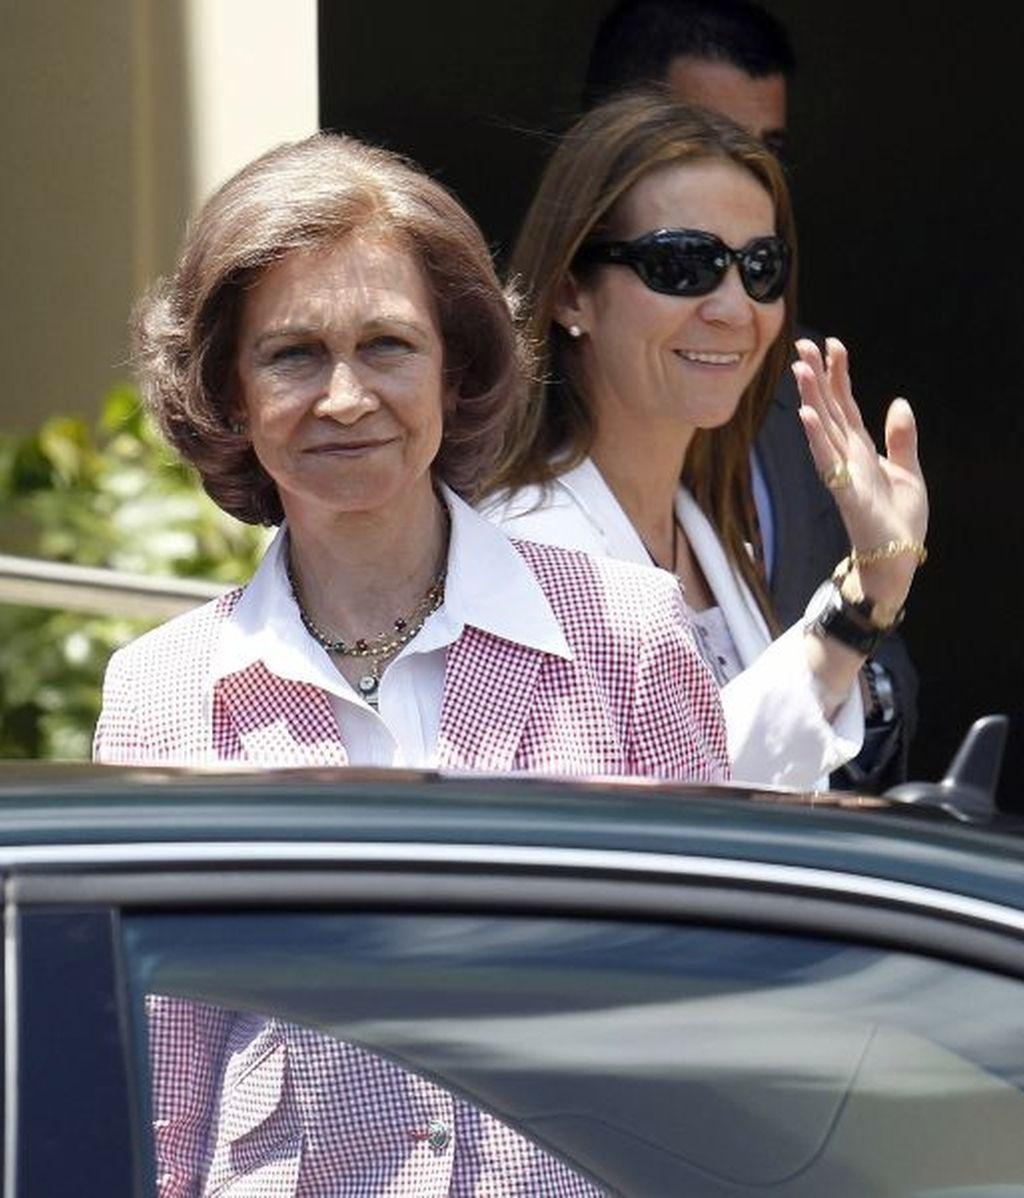 La reina Sofía y la infanta Elena, a la salida del hospital